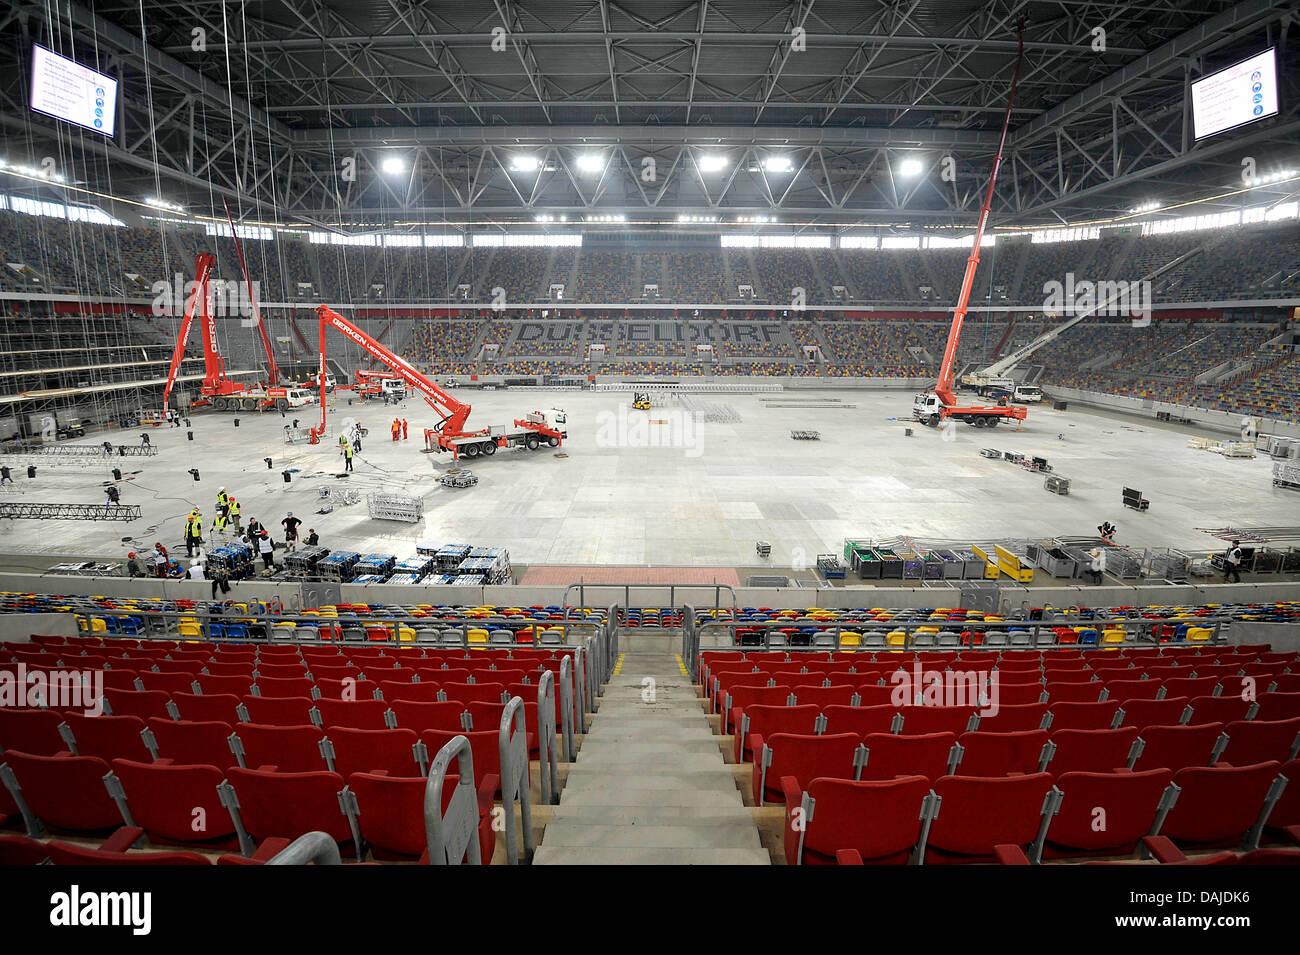 Arena 2011